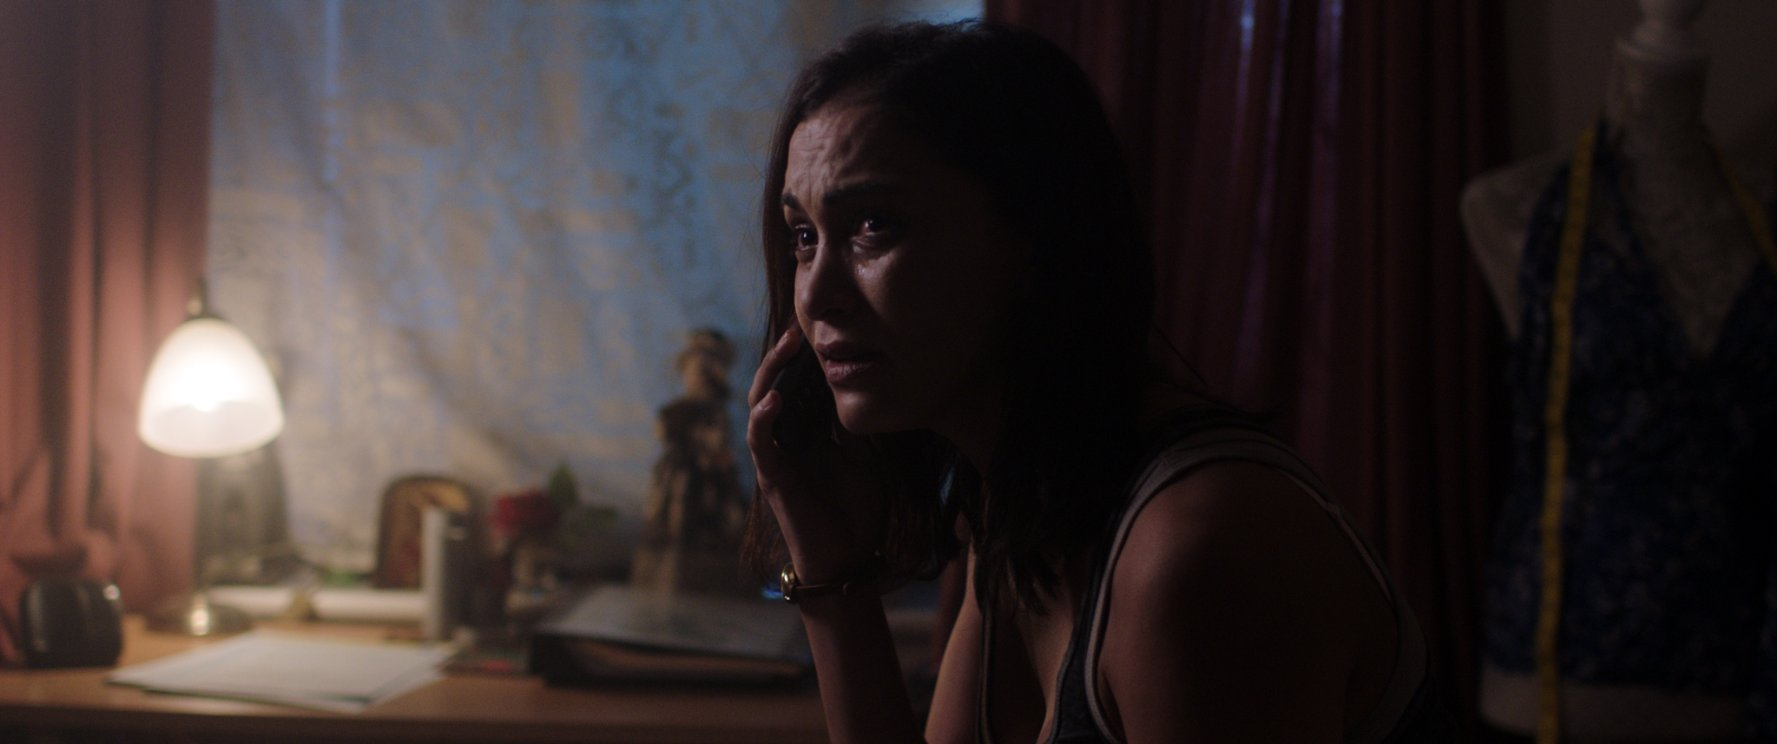 Broken-2016-horror-film-Morjana-Alaouimrhorrorpedia